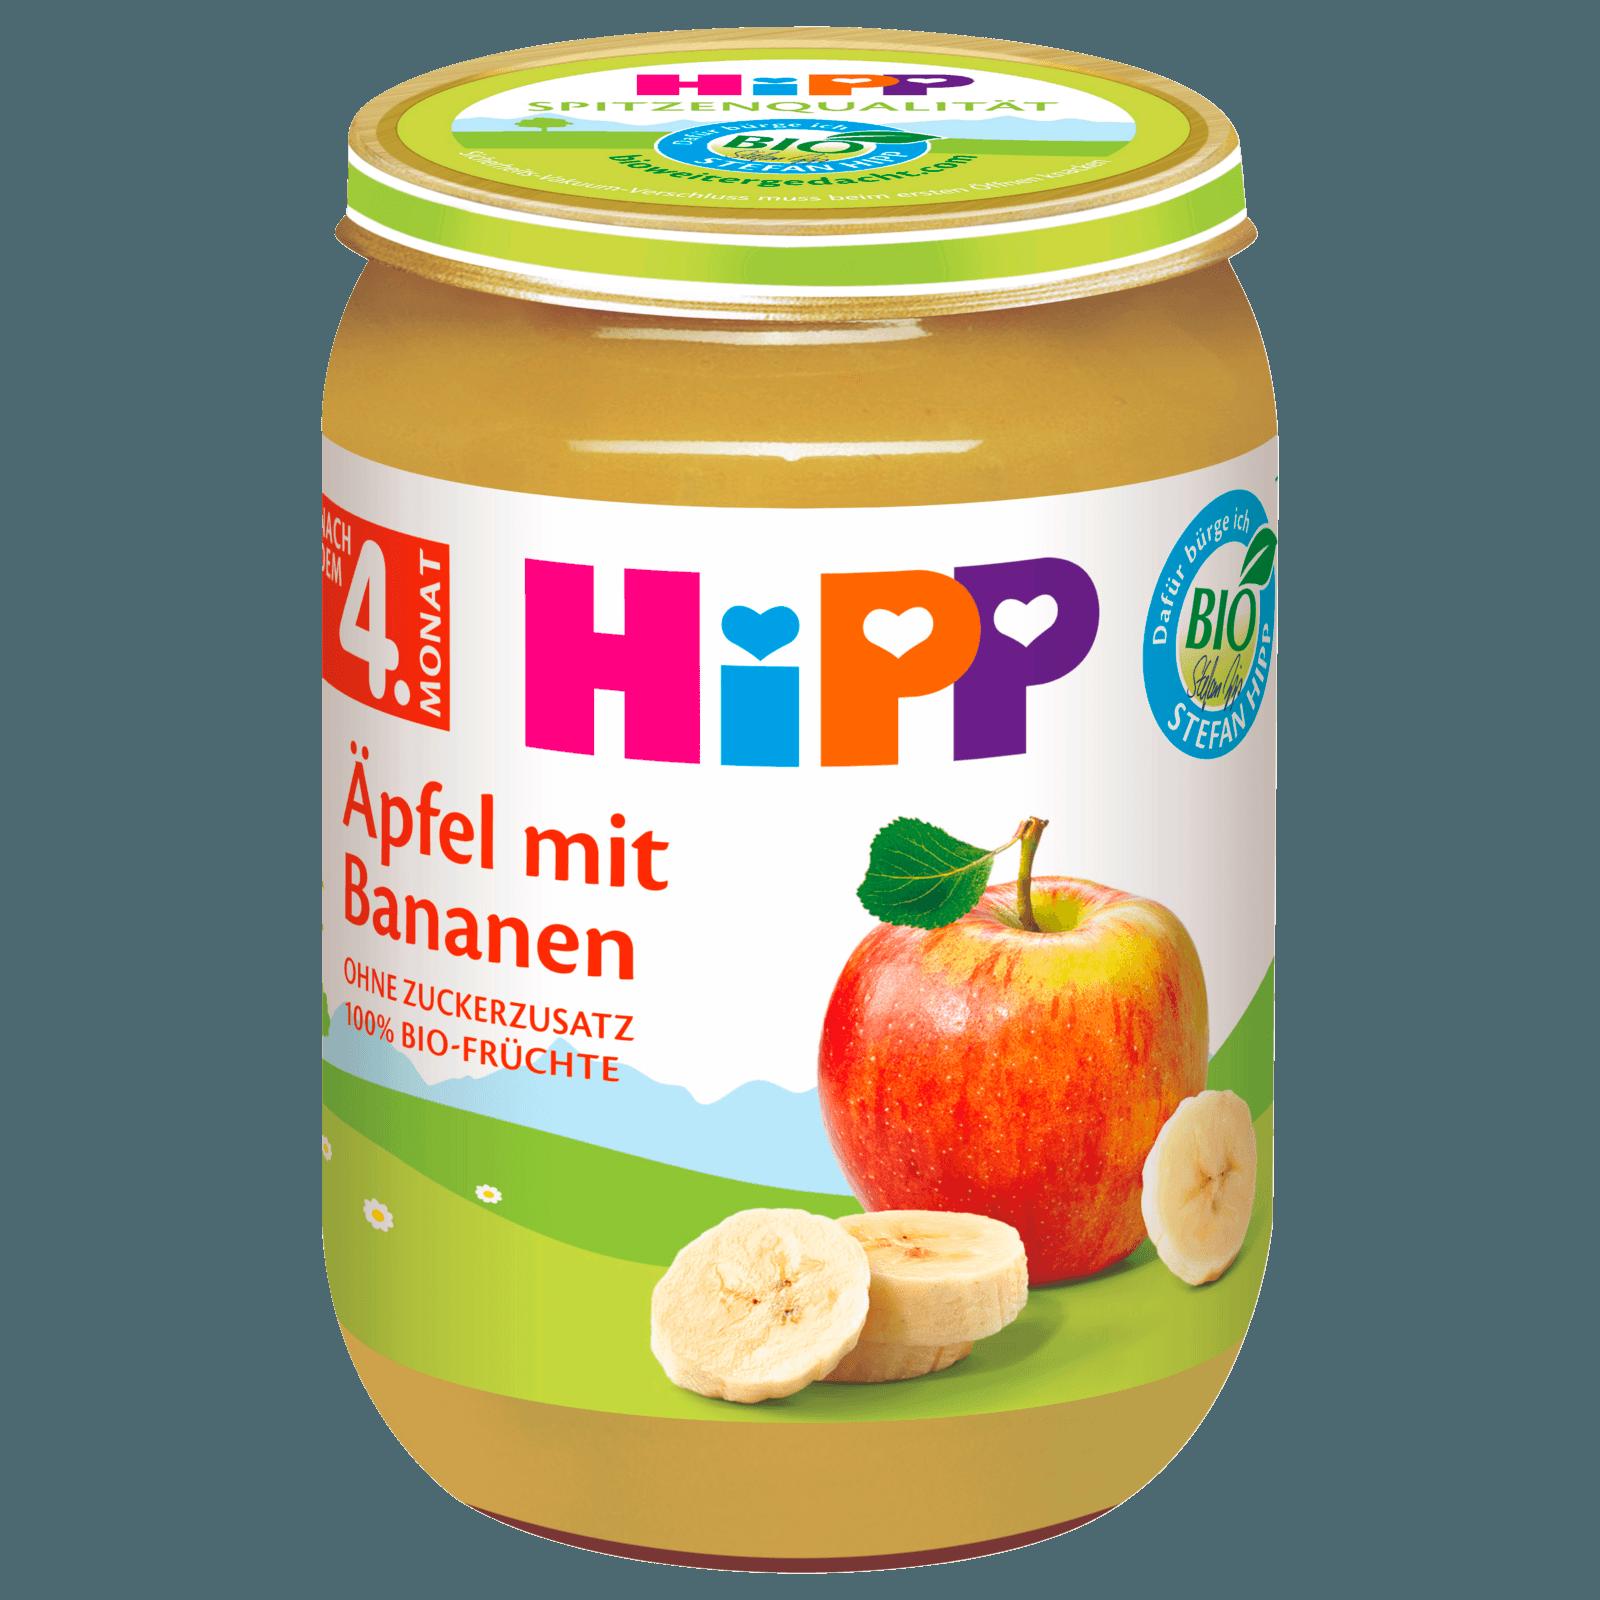 Hipp Äpfel mit Bananen 190g